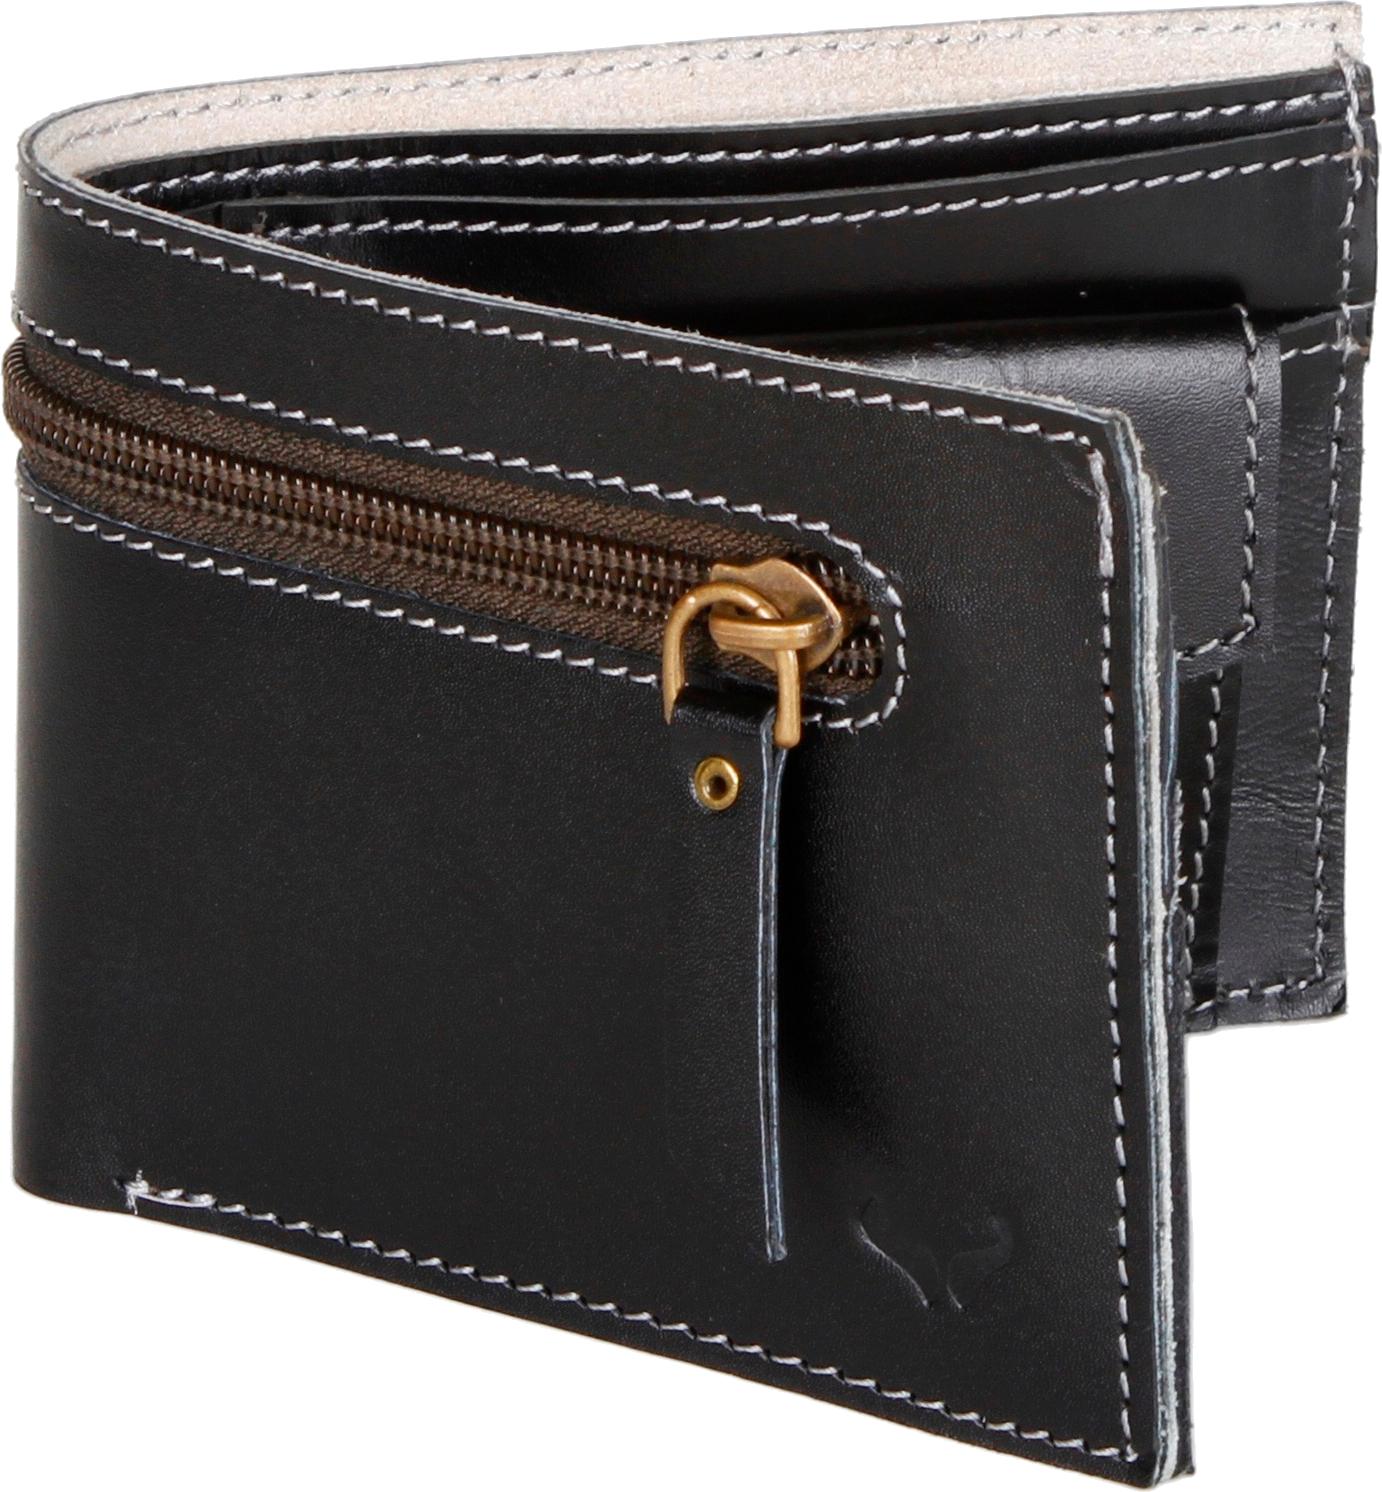 Wallet PNG - 2291